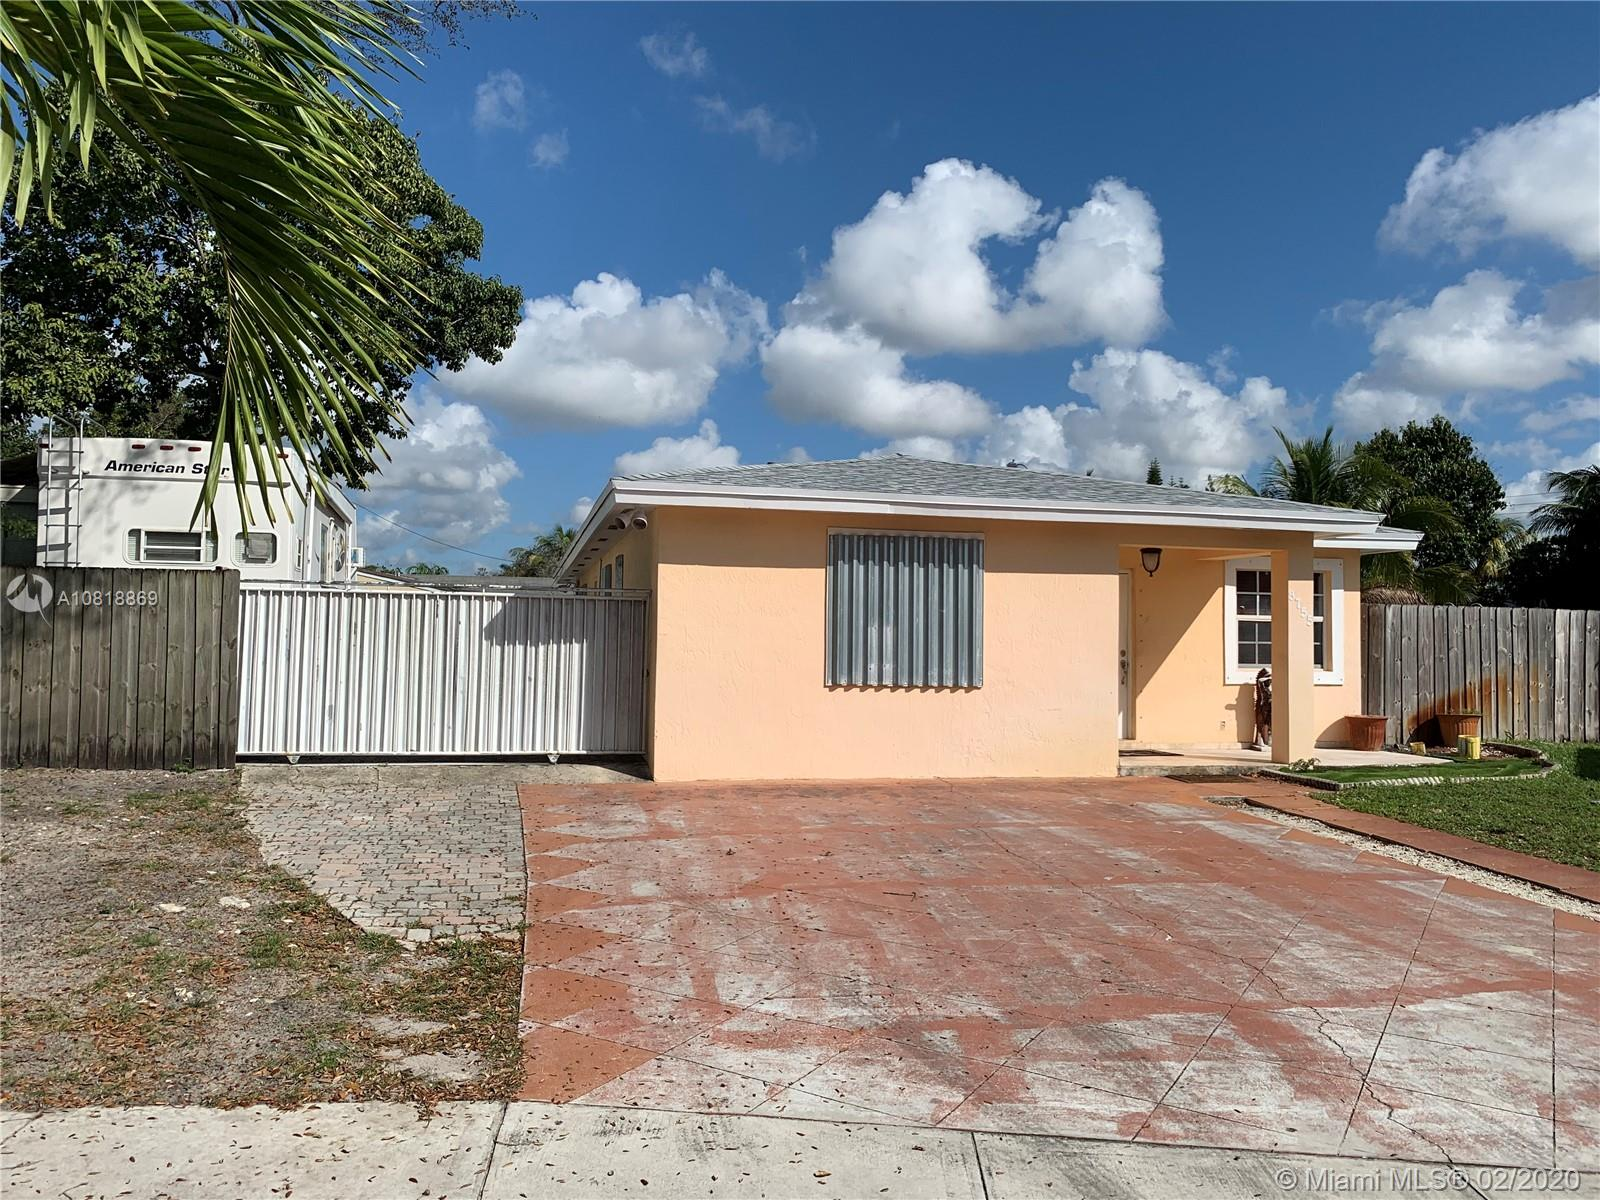 3755 NW 211th St, Miami Gardens, FL 33055